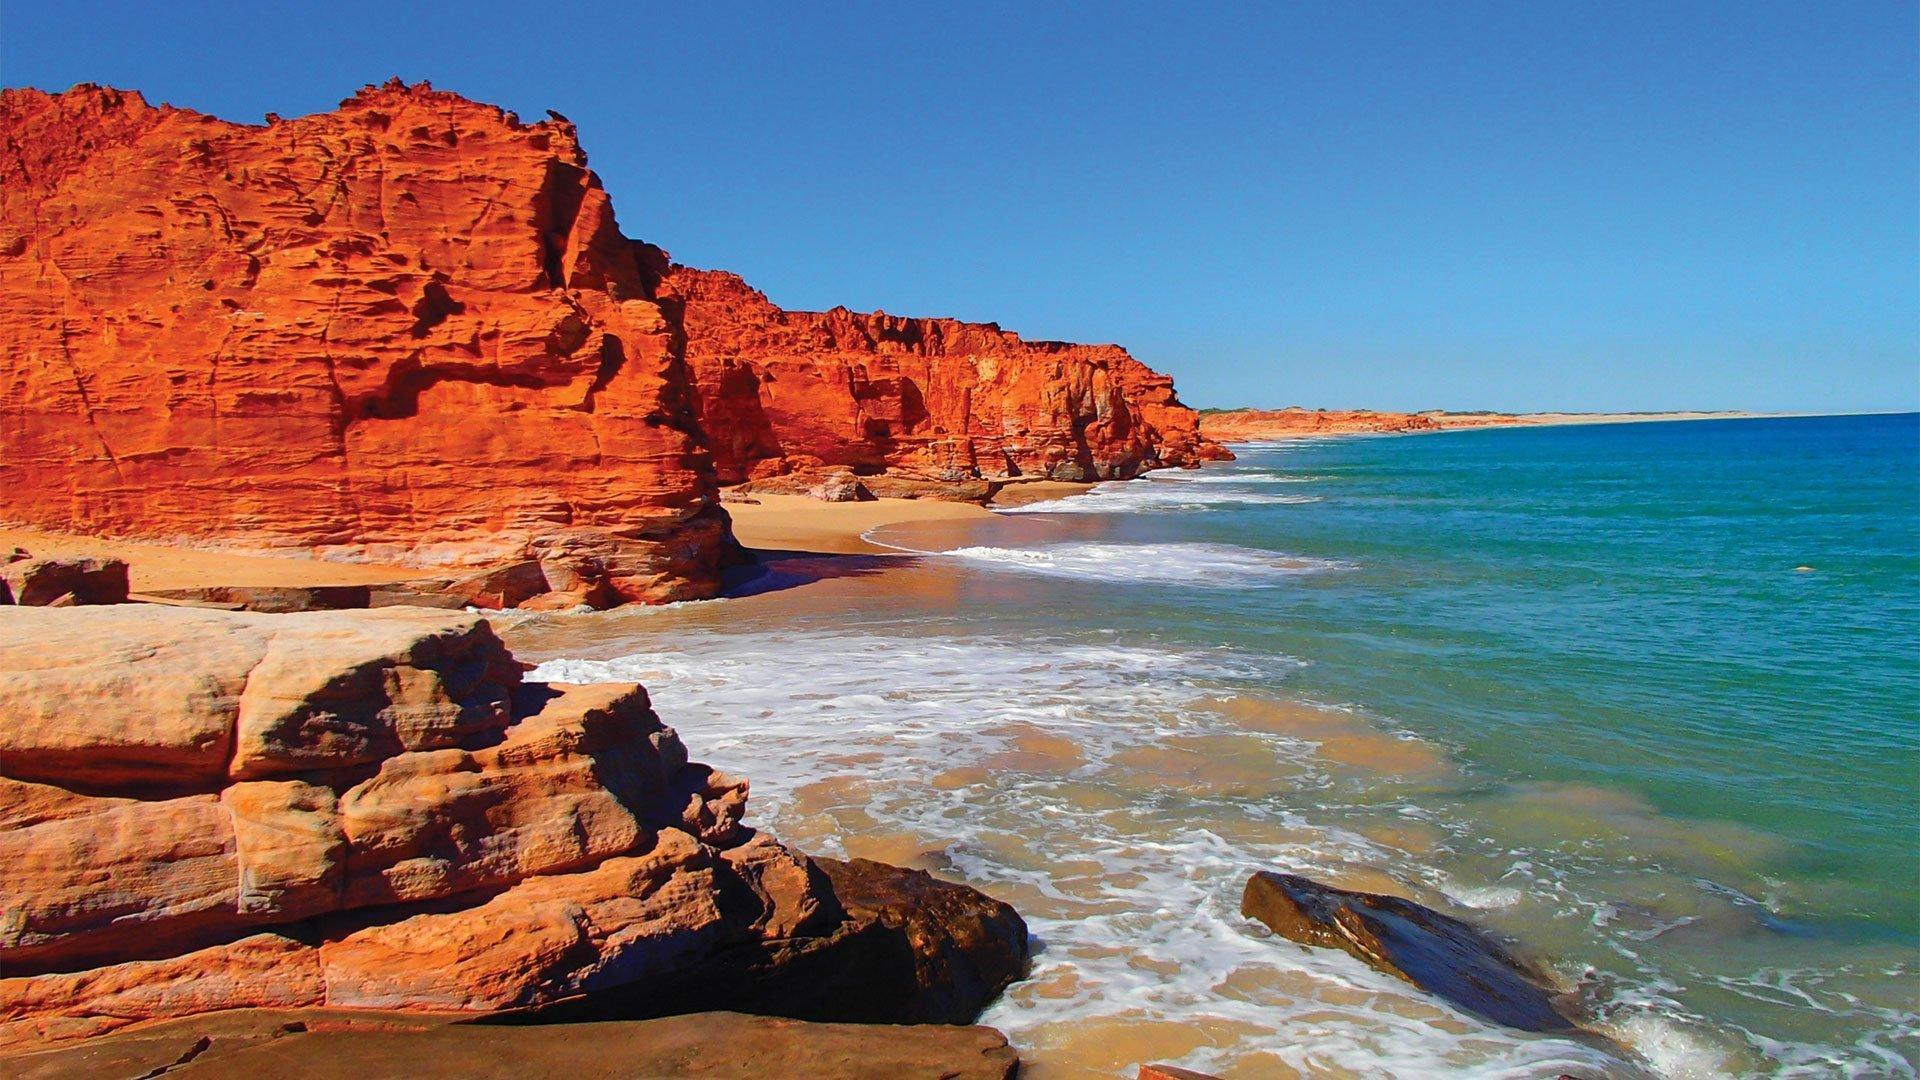 Beach, scenery, destination